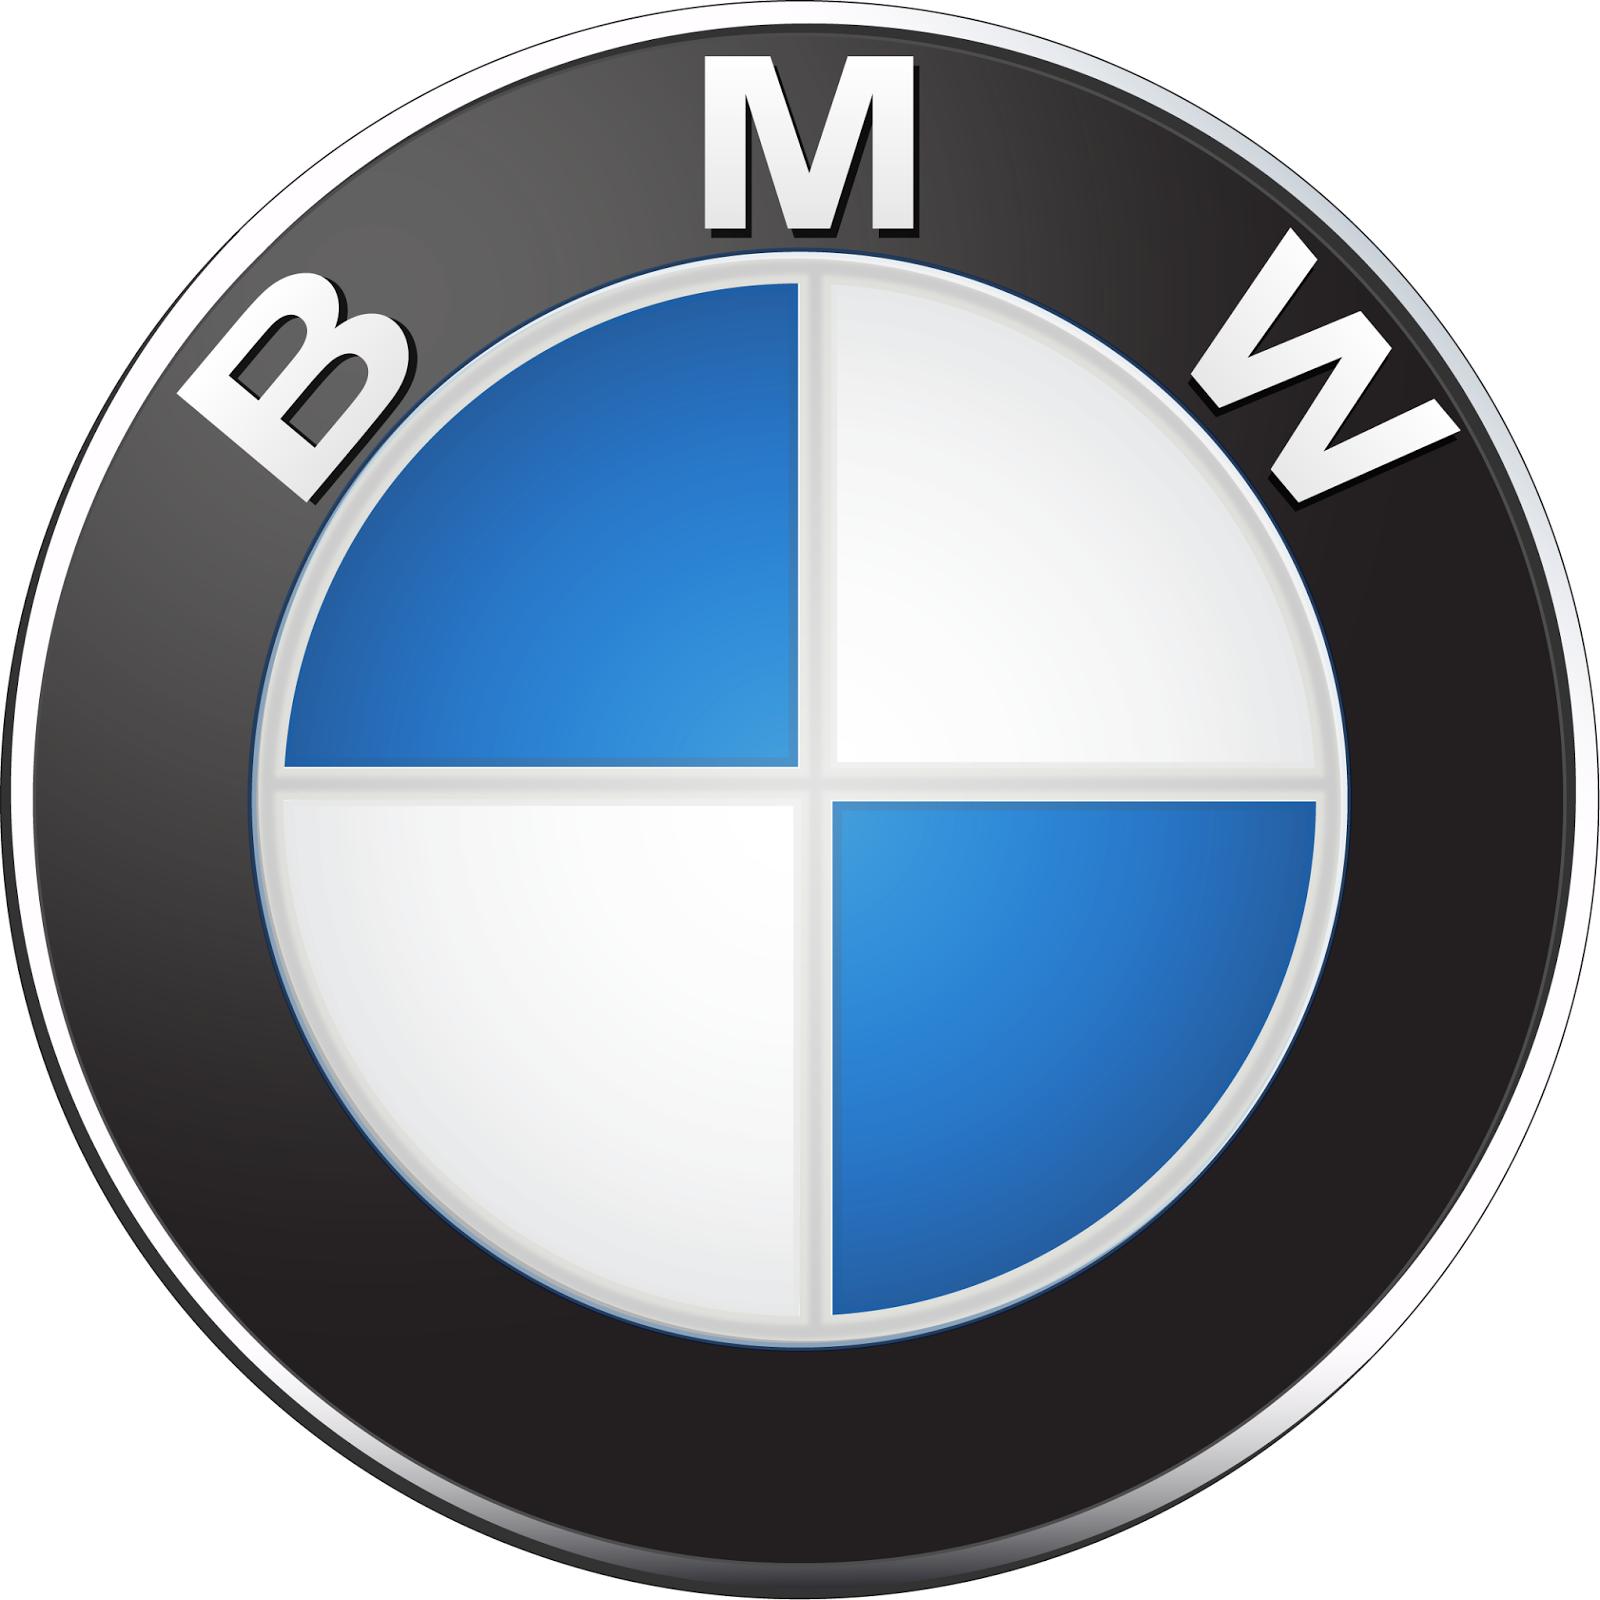 Logos And Symbols Logo Of Bmw